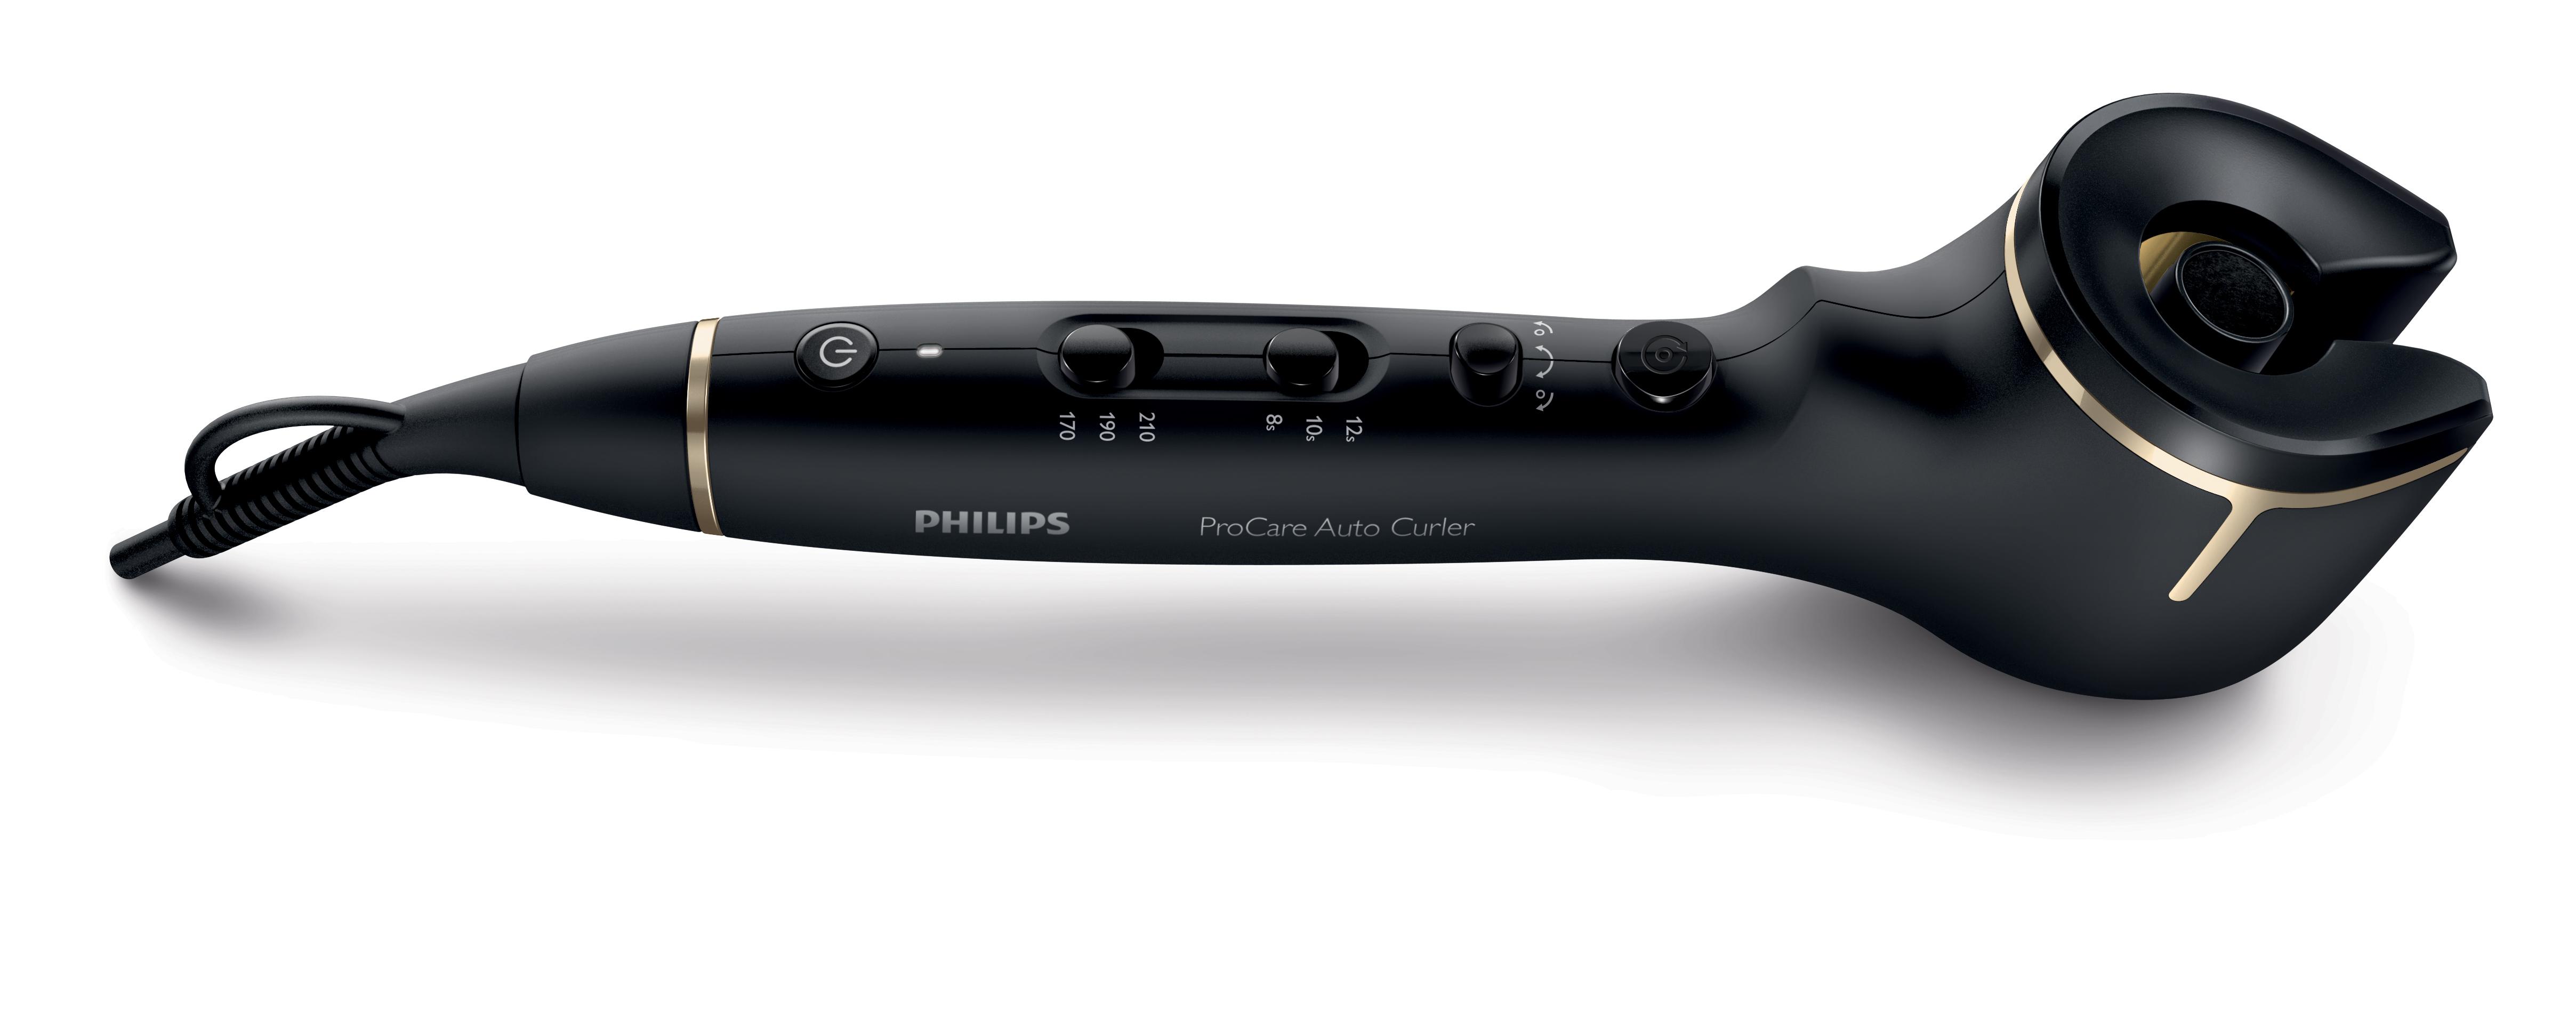 Philips_ProCurler_HPS940_00_Product02